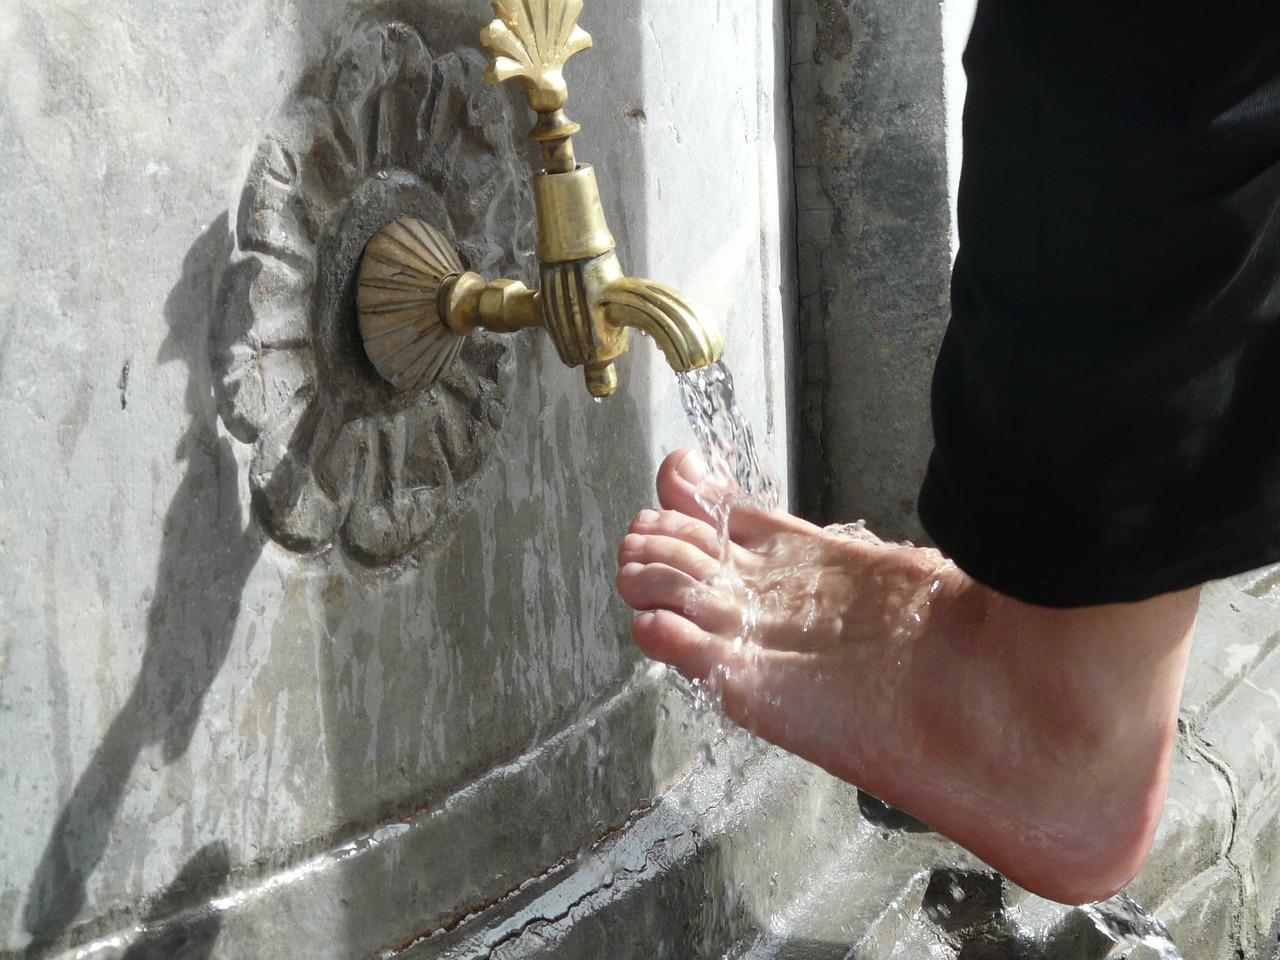 washing, ritual, foot care-64793.jpg